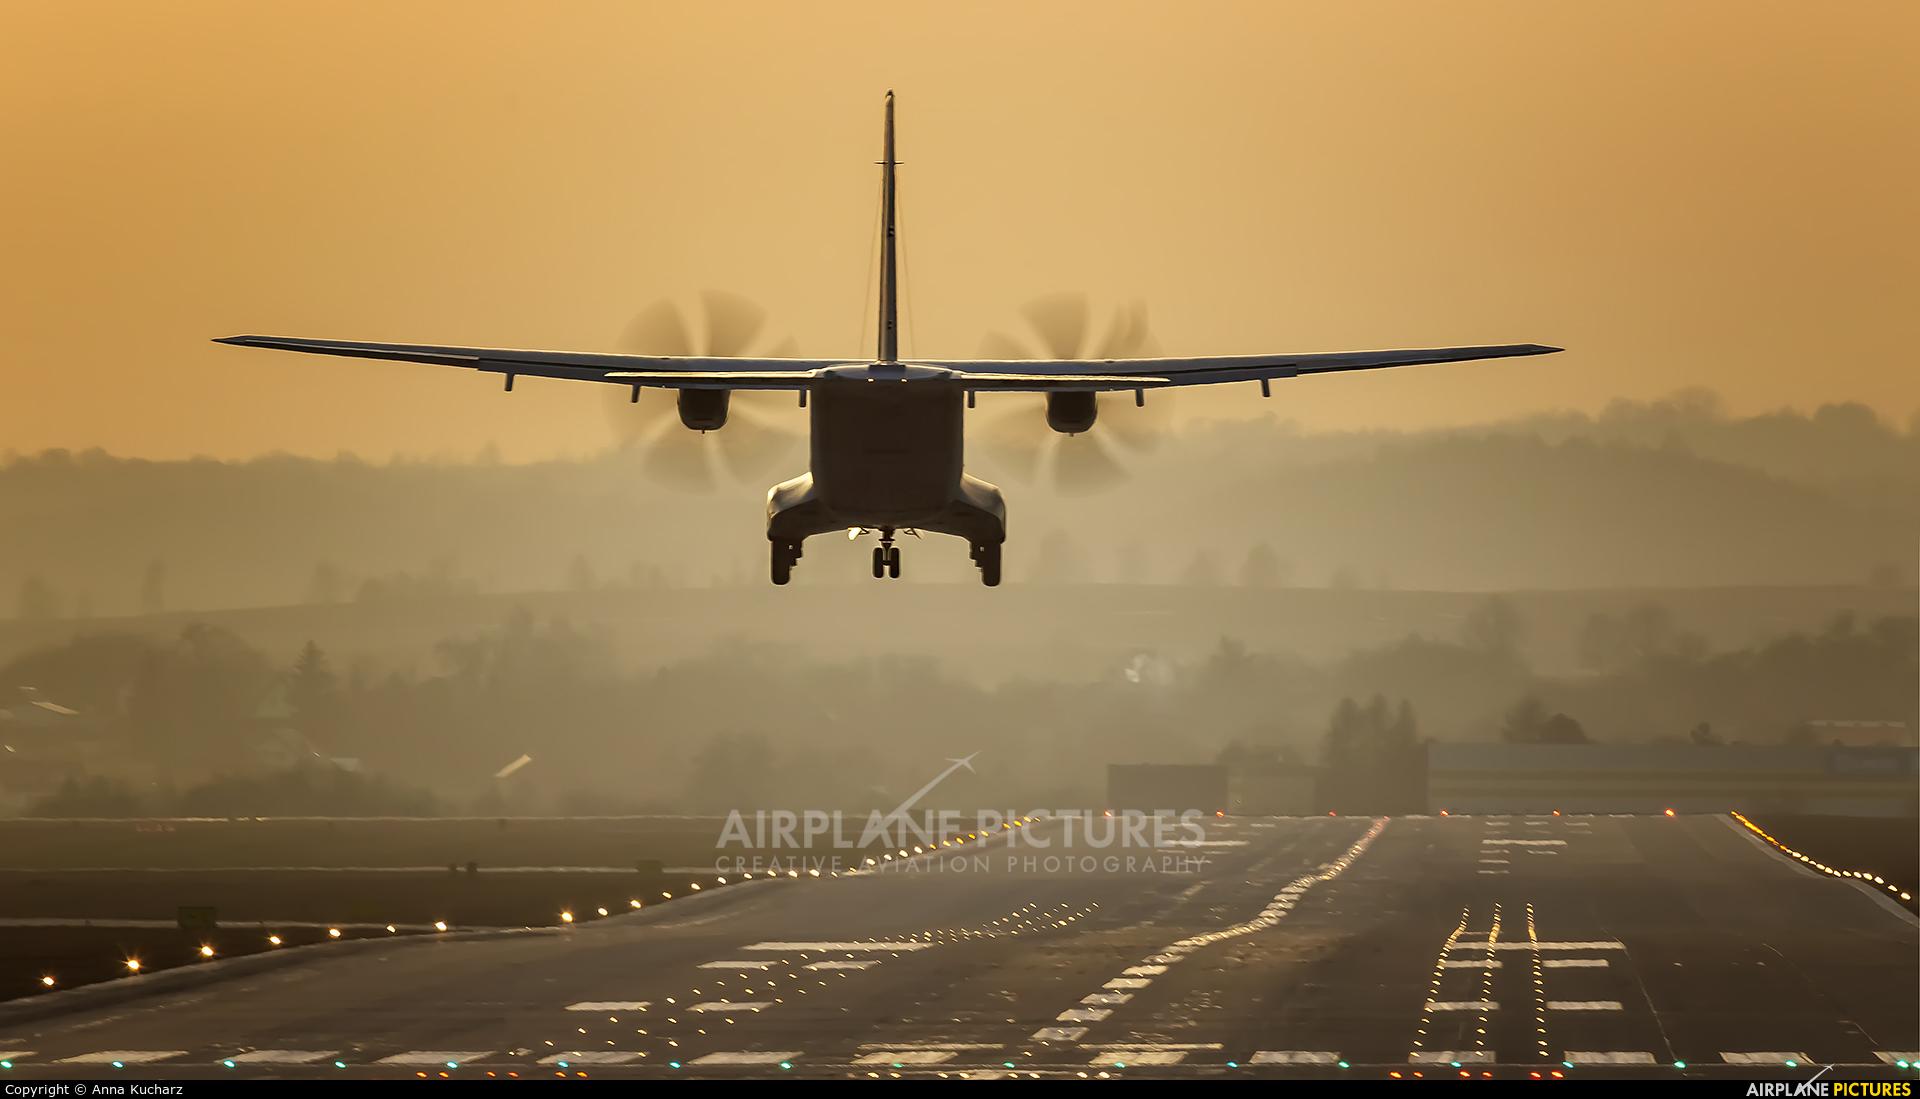 Poland - Air Force 017 aircraft at Kraków - John Paul II Intl